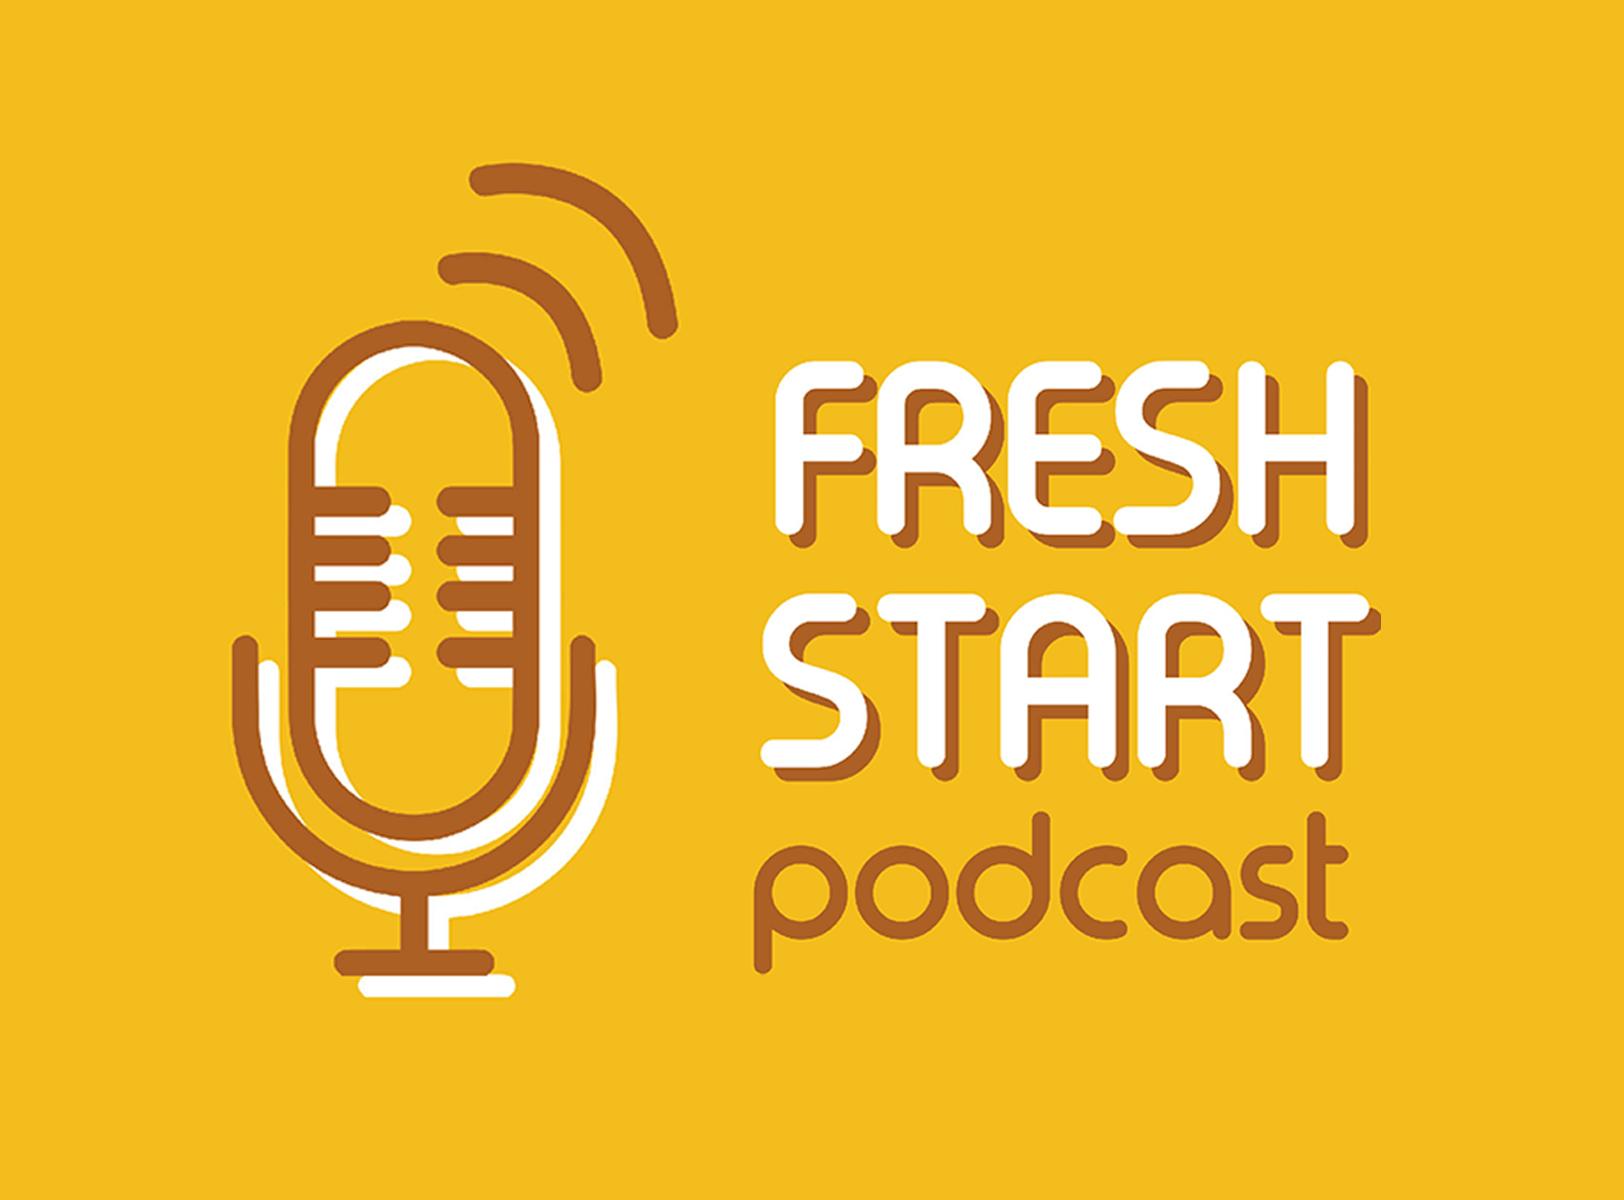 Fresh Start: Podcast News (7/24/2018 Tue.)